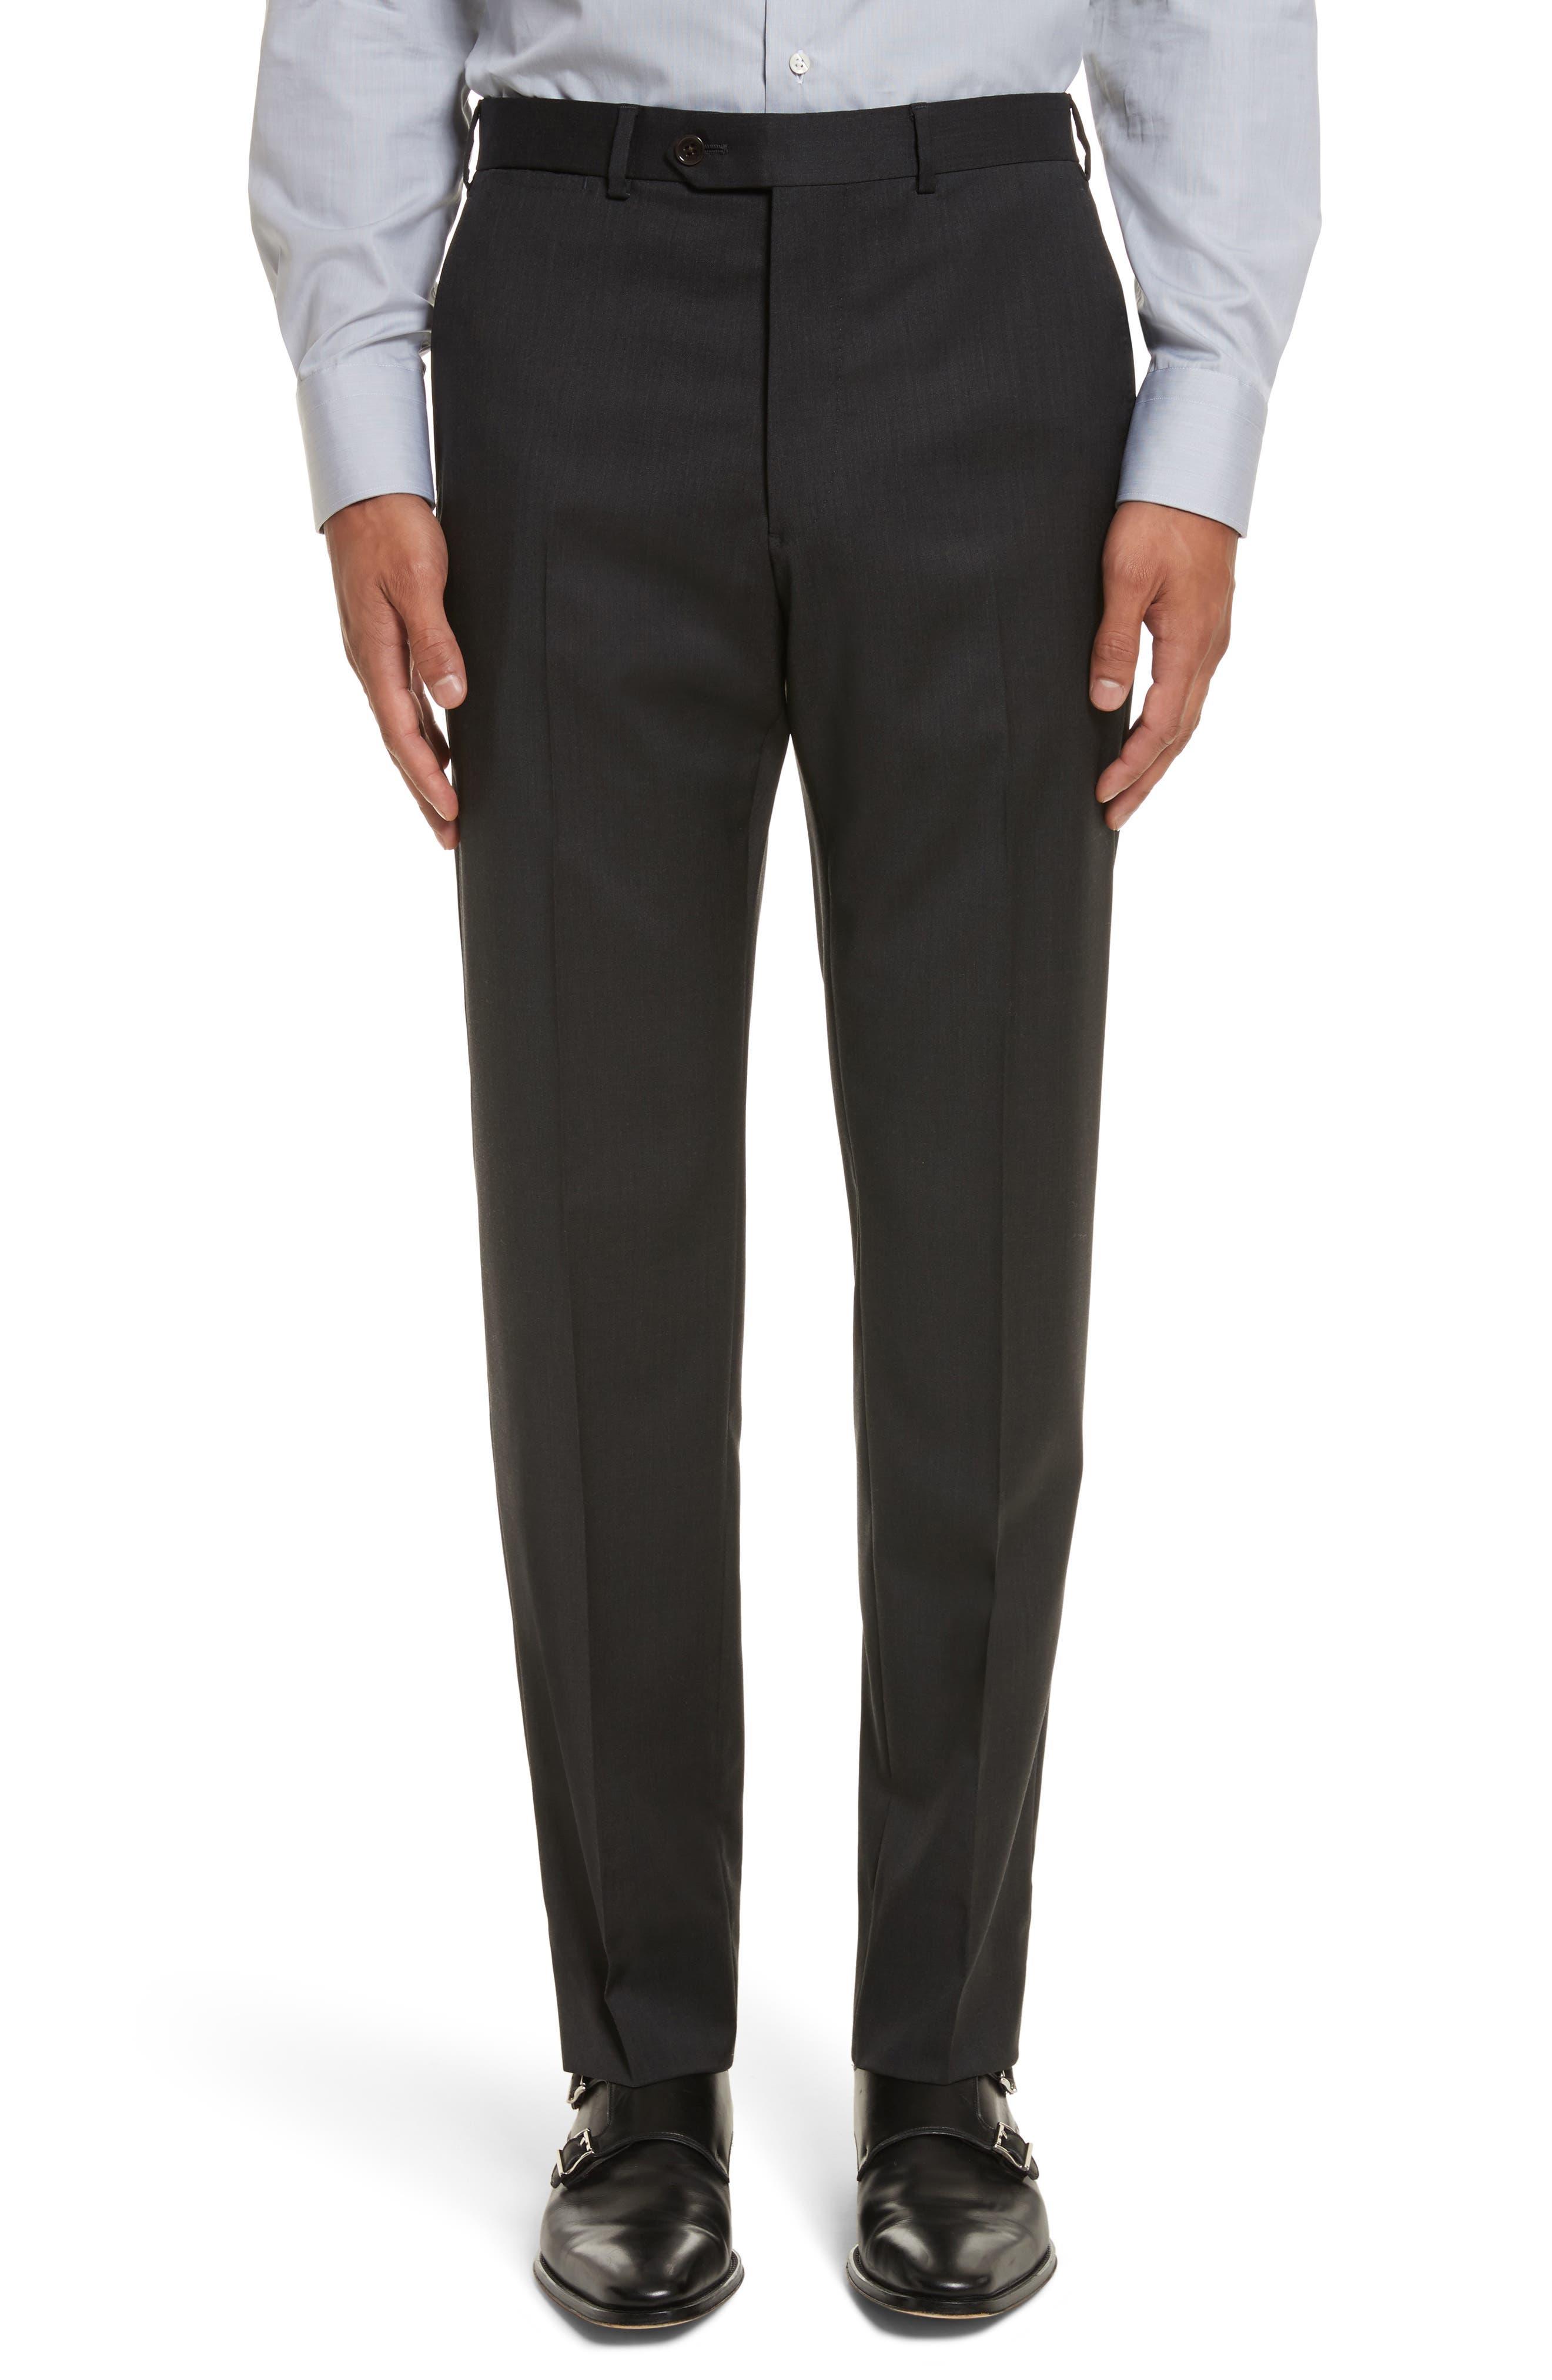 'G-Line' Trim Fit Solid Wool Suit,                             Alternate thumbnail 6, color,                             Charcoal